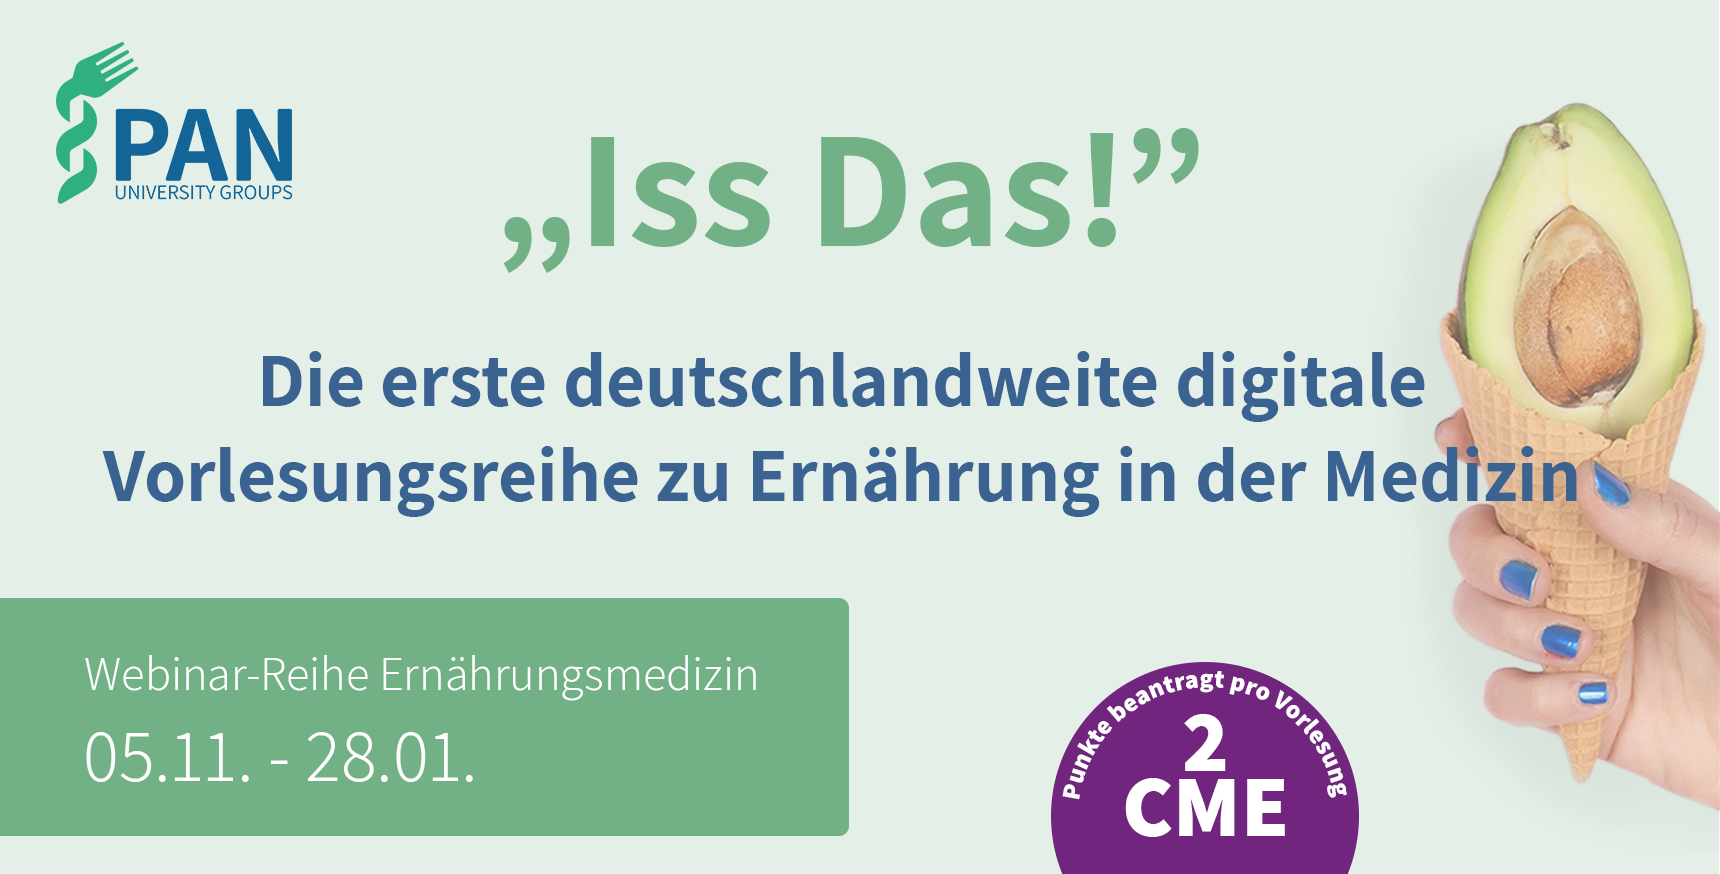 202011-Event-header-Iss-Das-Webinar-Series-CME